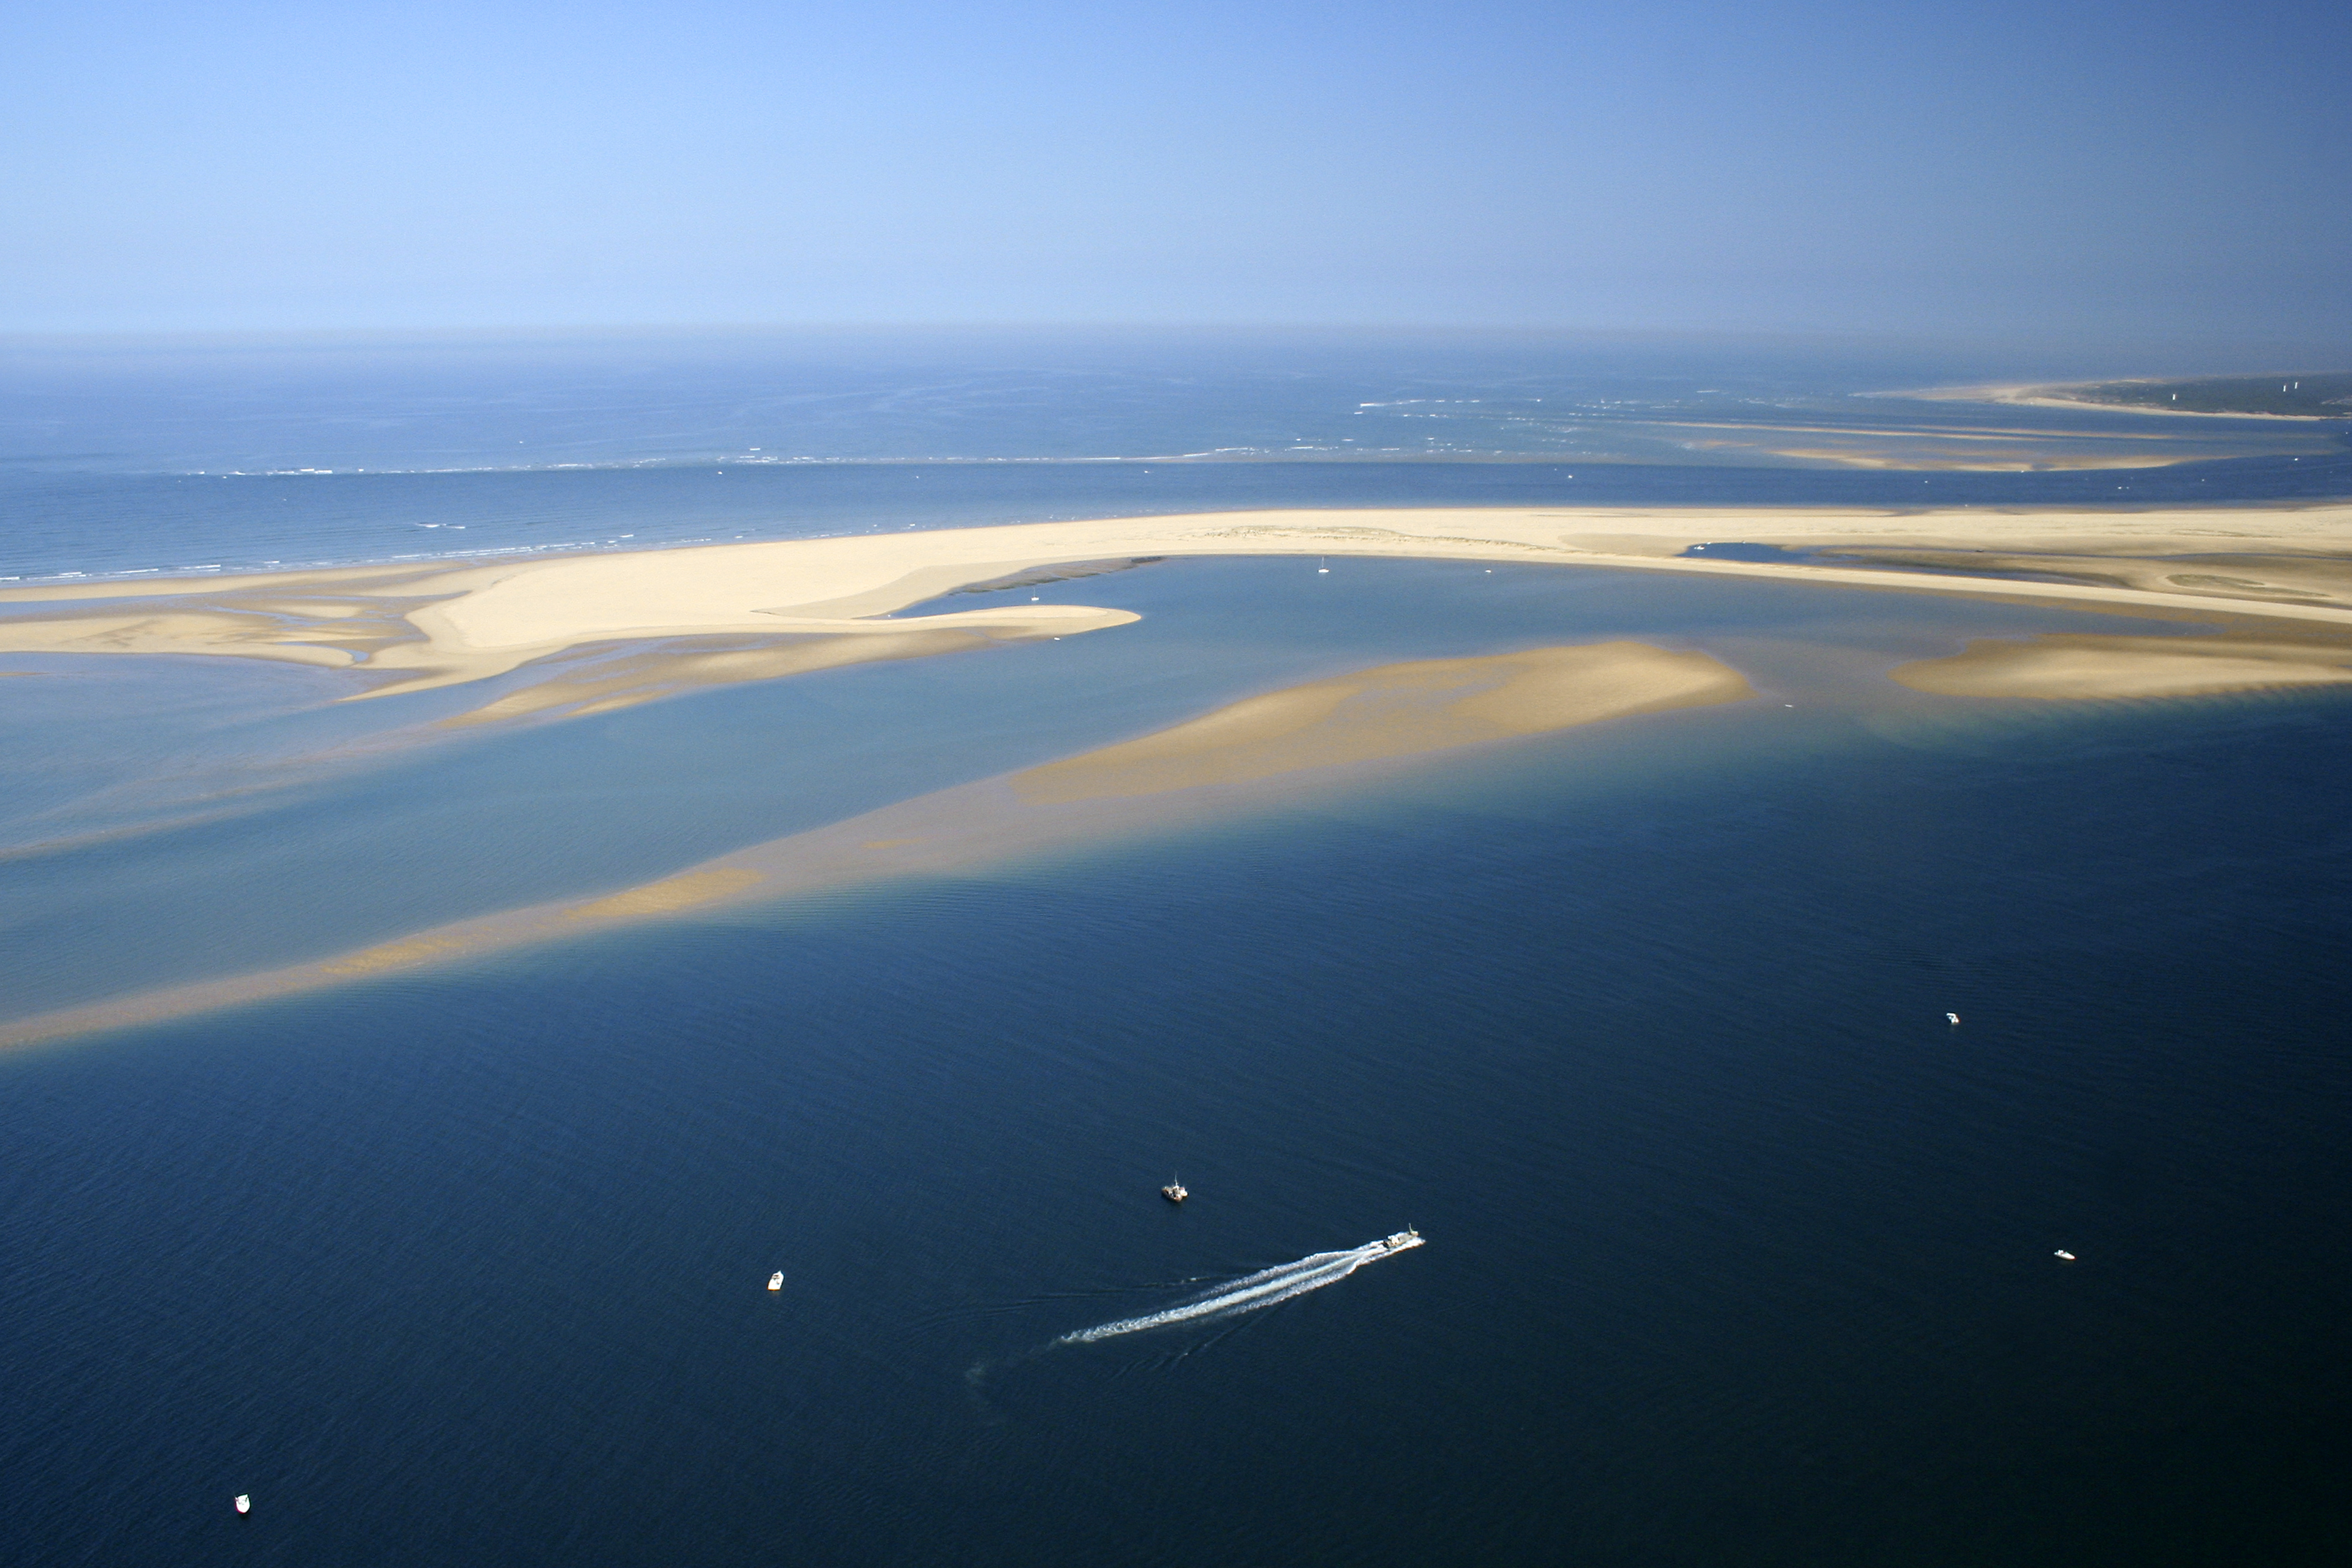 Banc Darguin Marque Bassin Arcachon